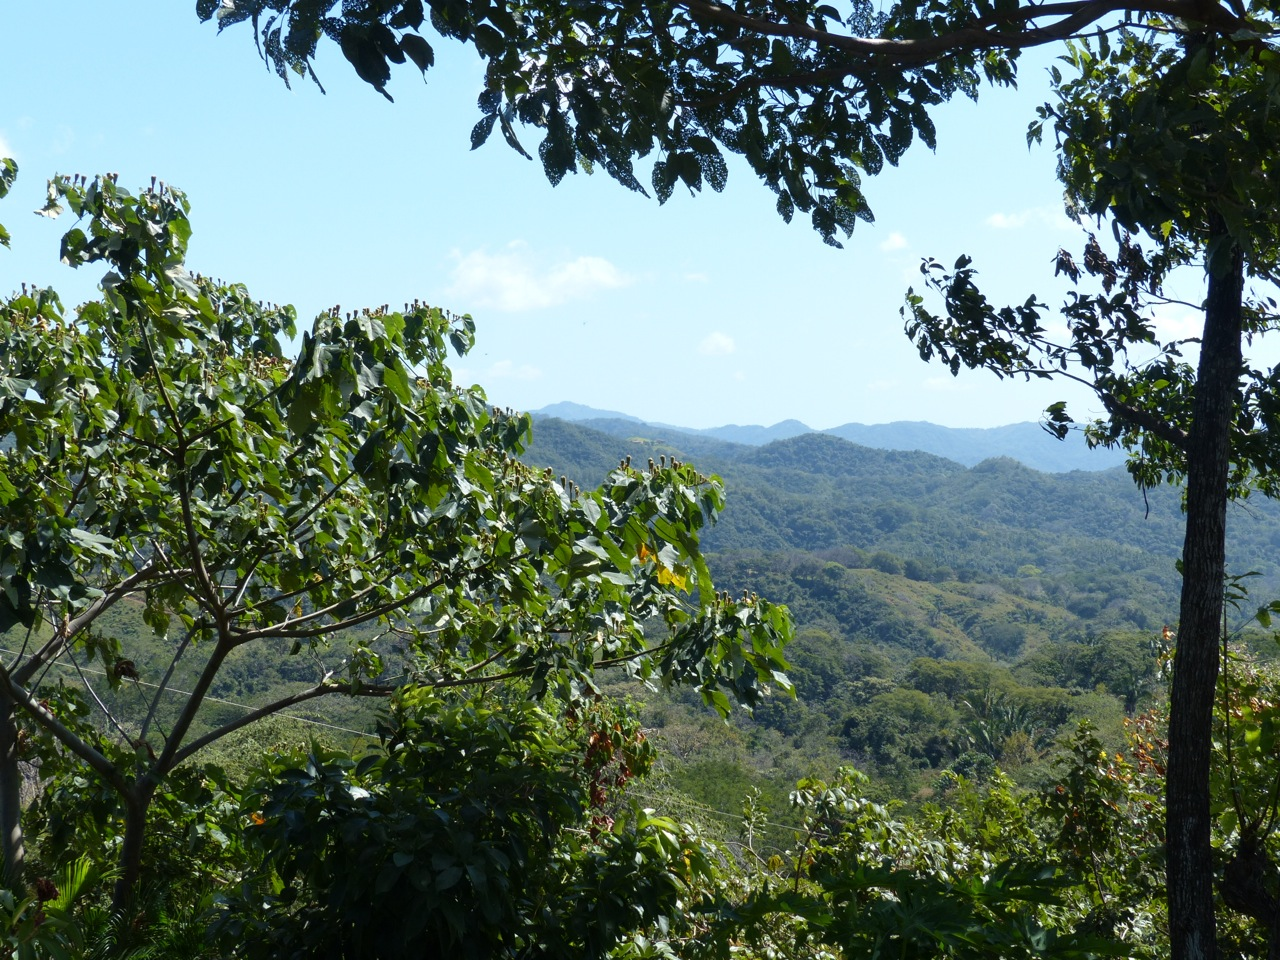 Costa Rica/Nosara (click me)